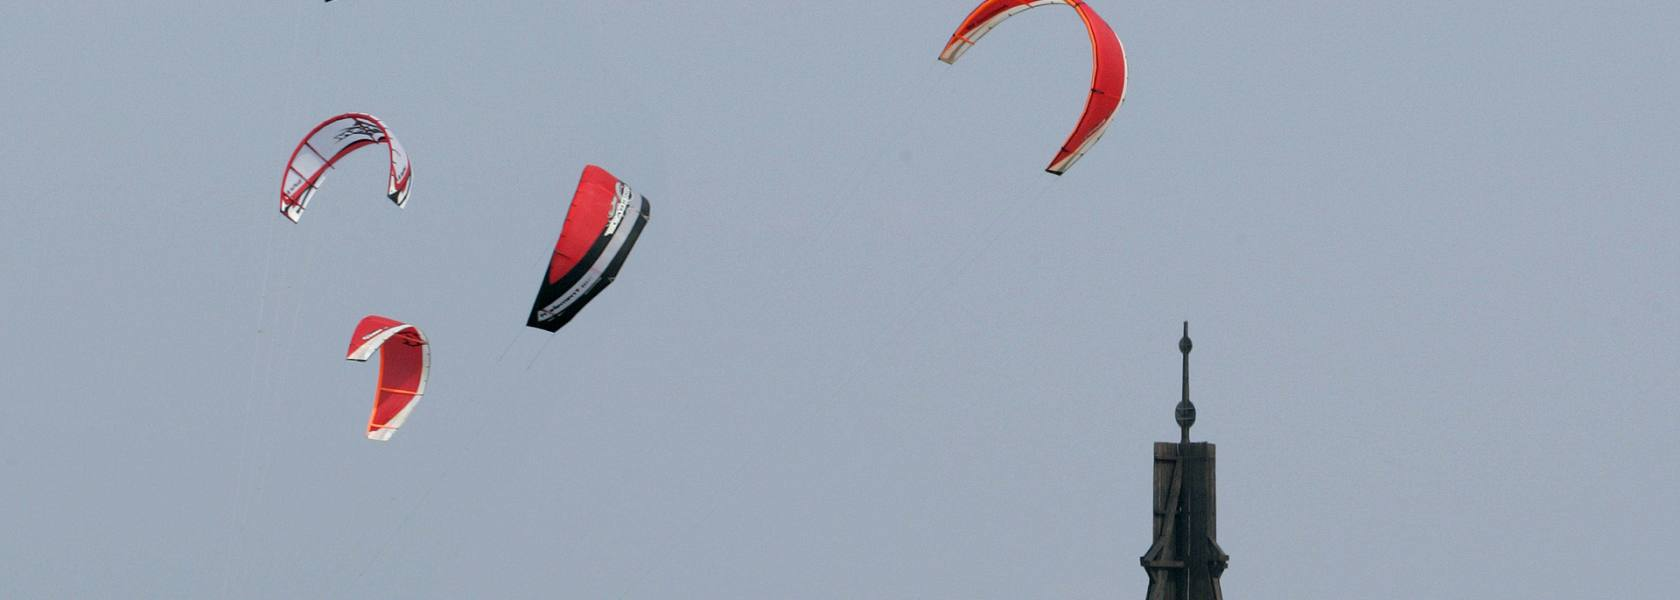 Kitesurfen in Cuxhaven, © Nordseeheilbad Cuxhaven GmbH